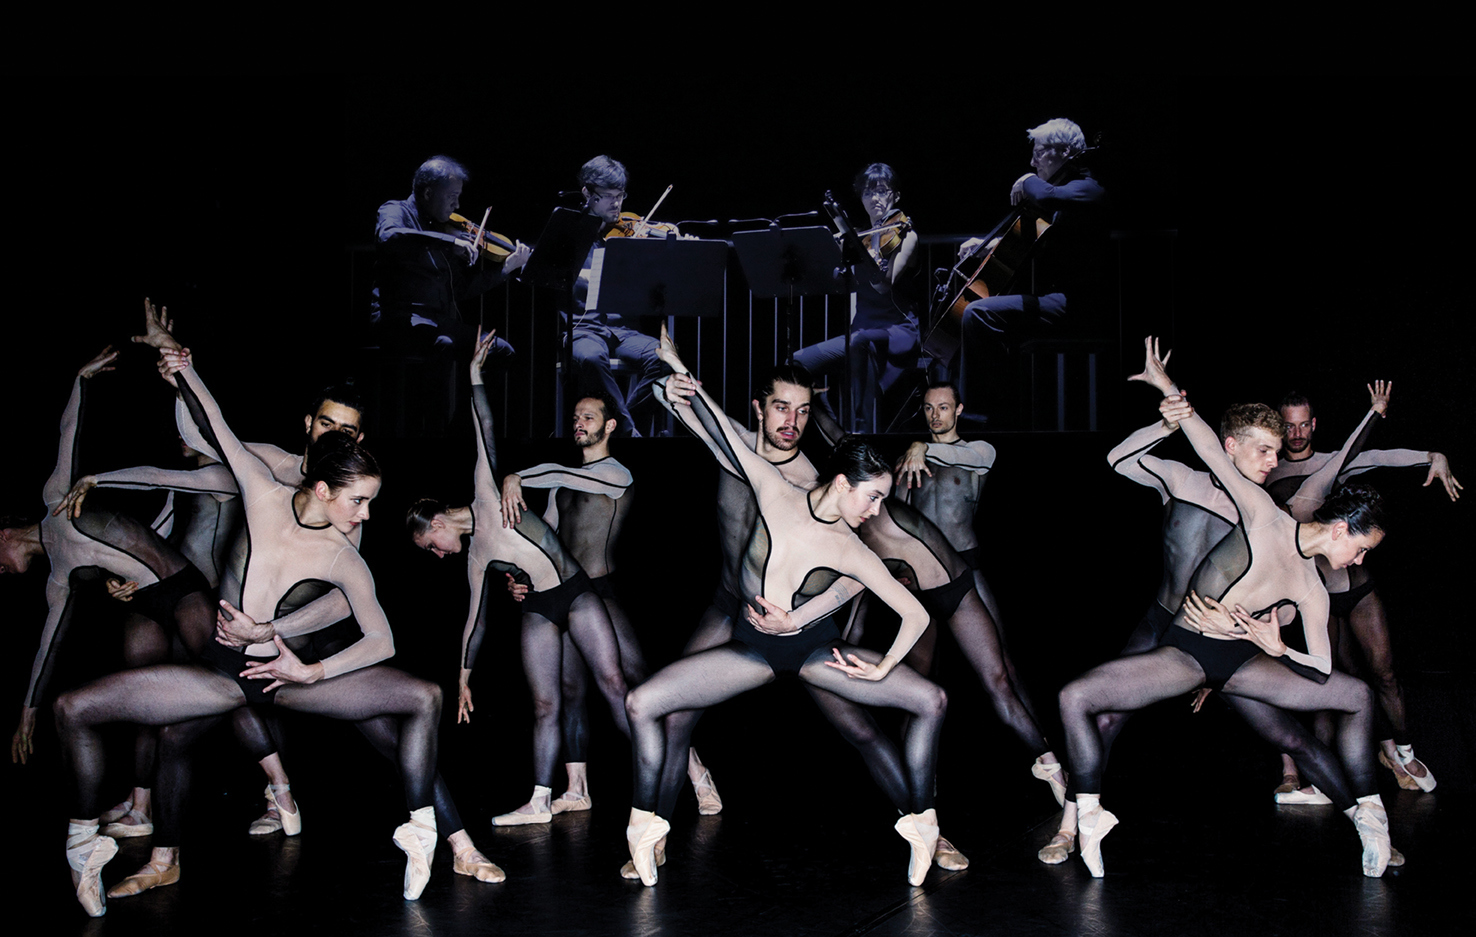 Джакопо Годани и его «Трилогия примата» — танец, напоминающий кружева